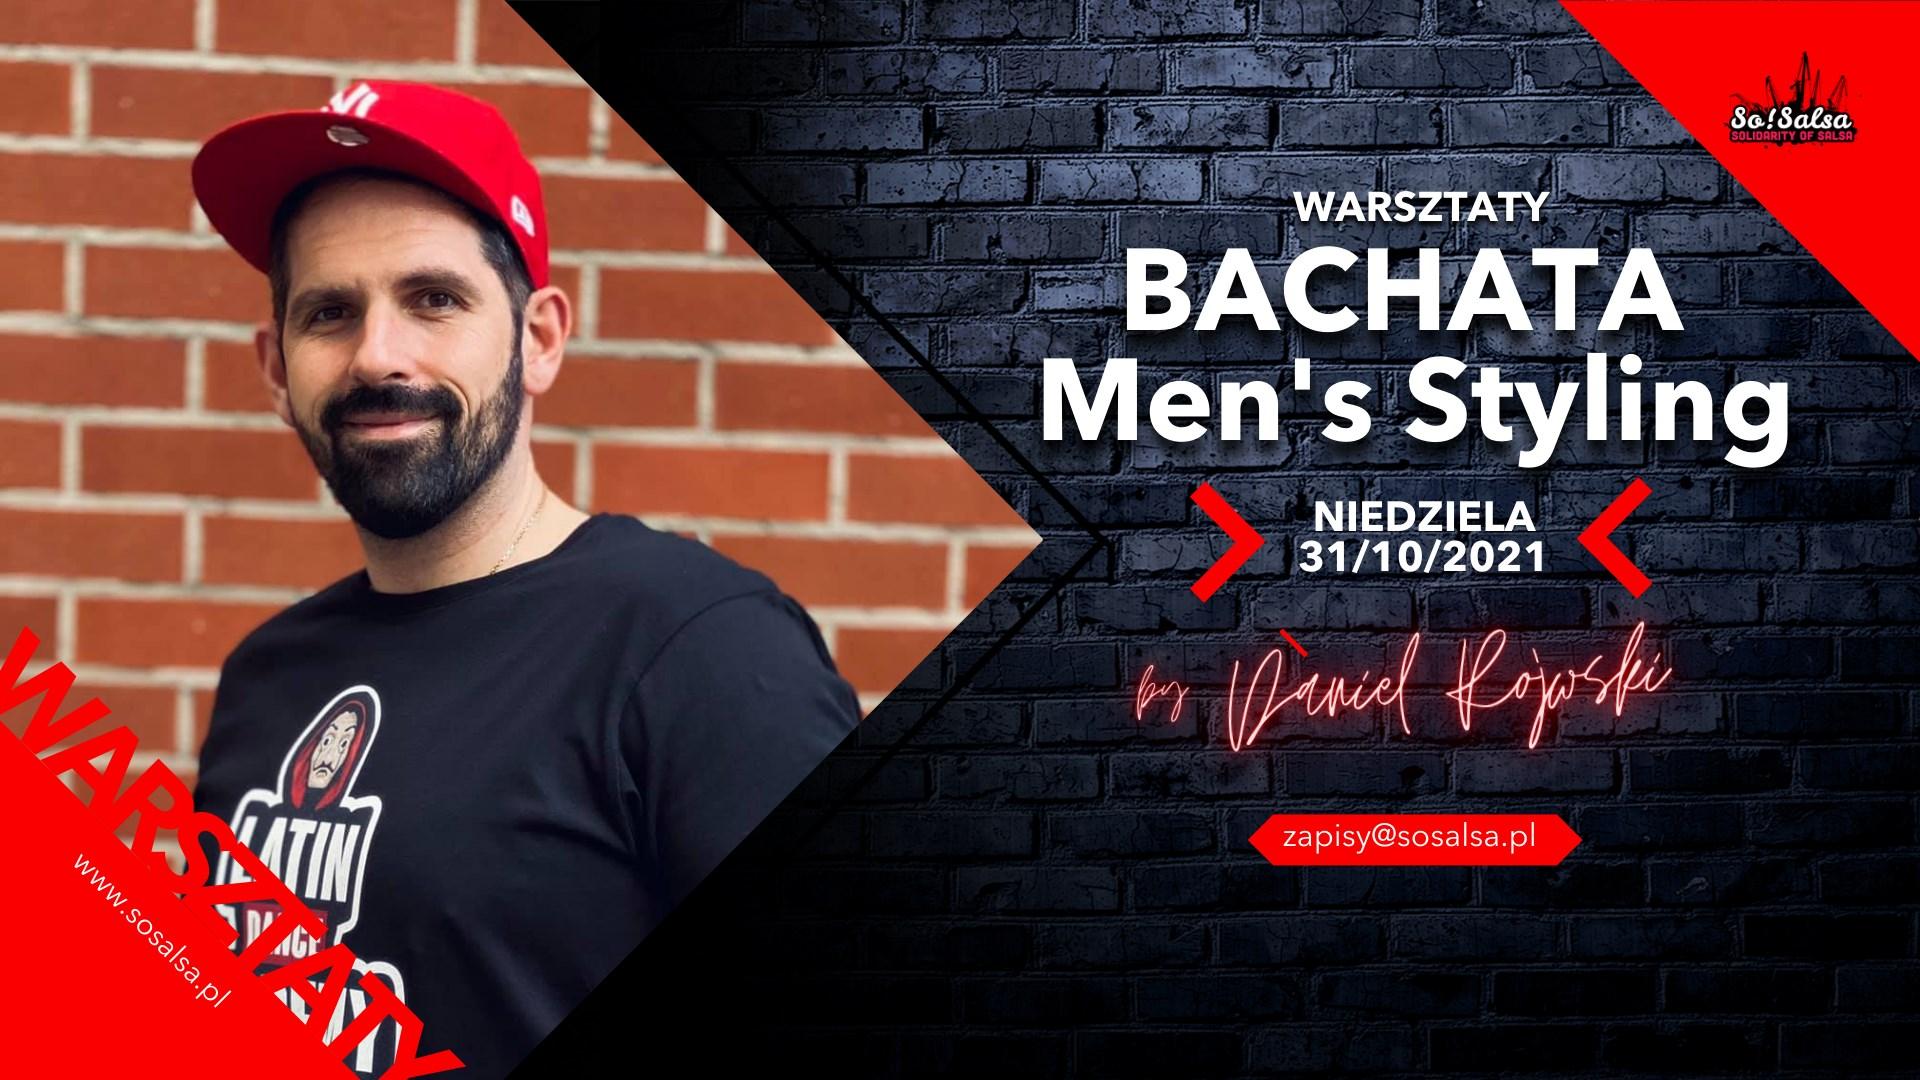 Bachata Men's Styling z Danielem Rojewskim